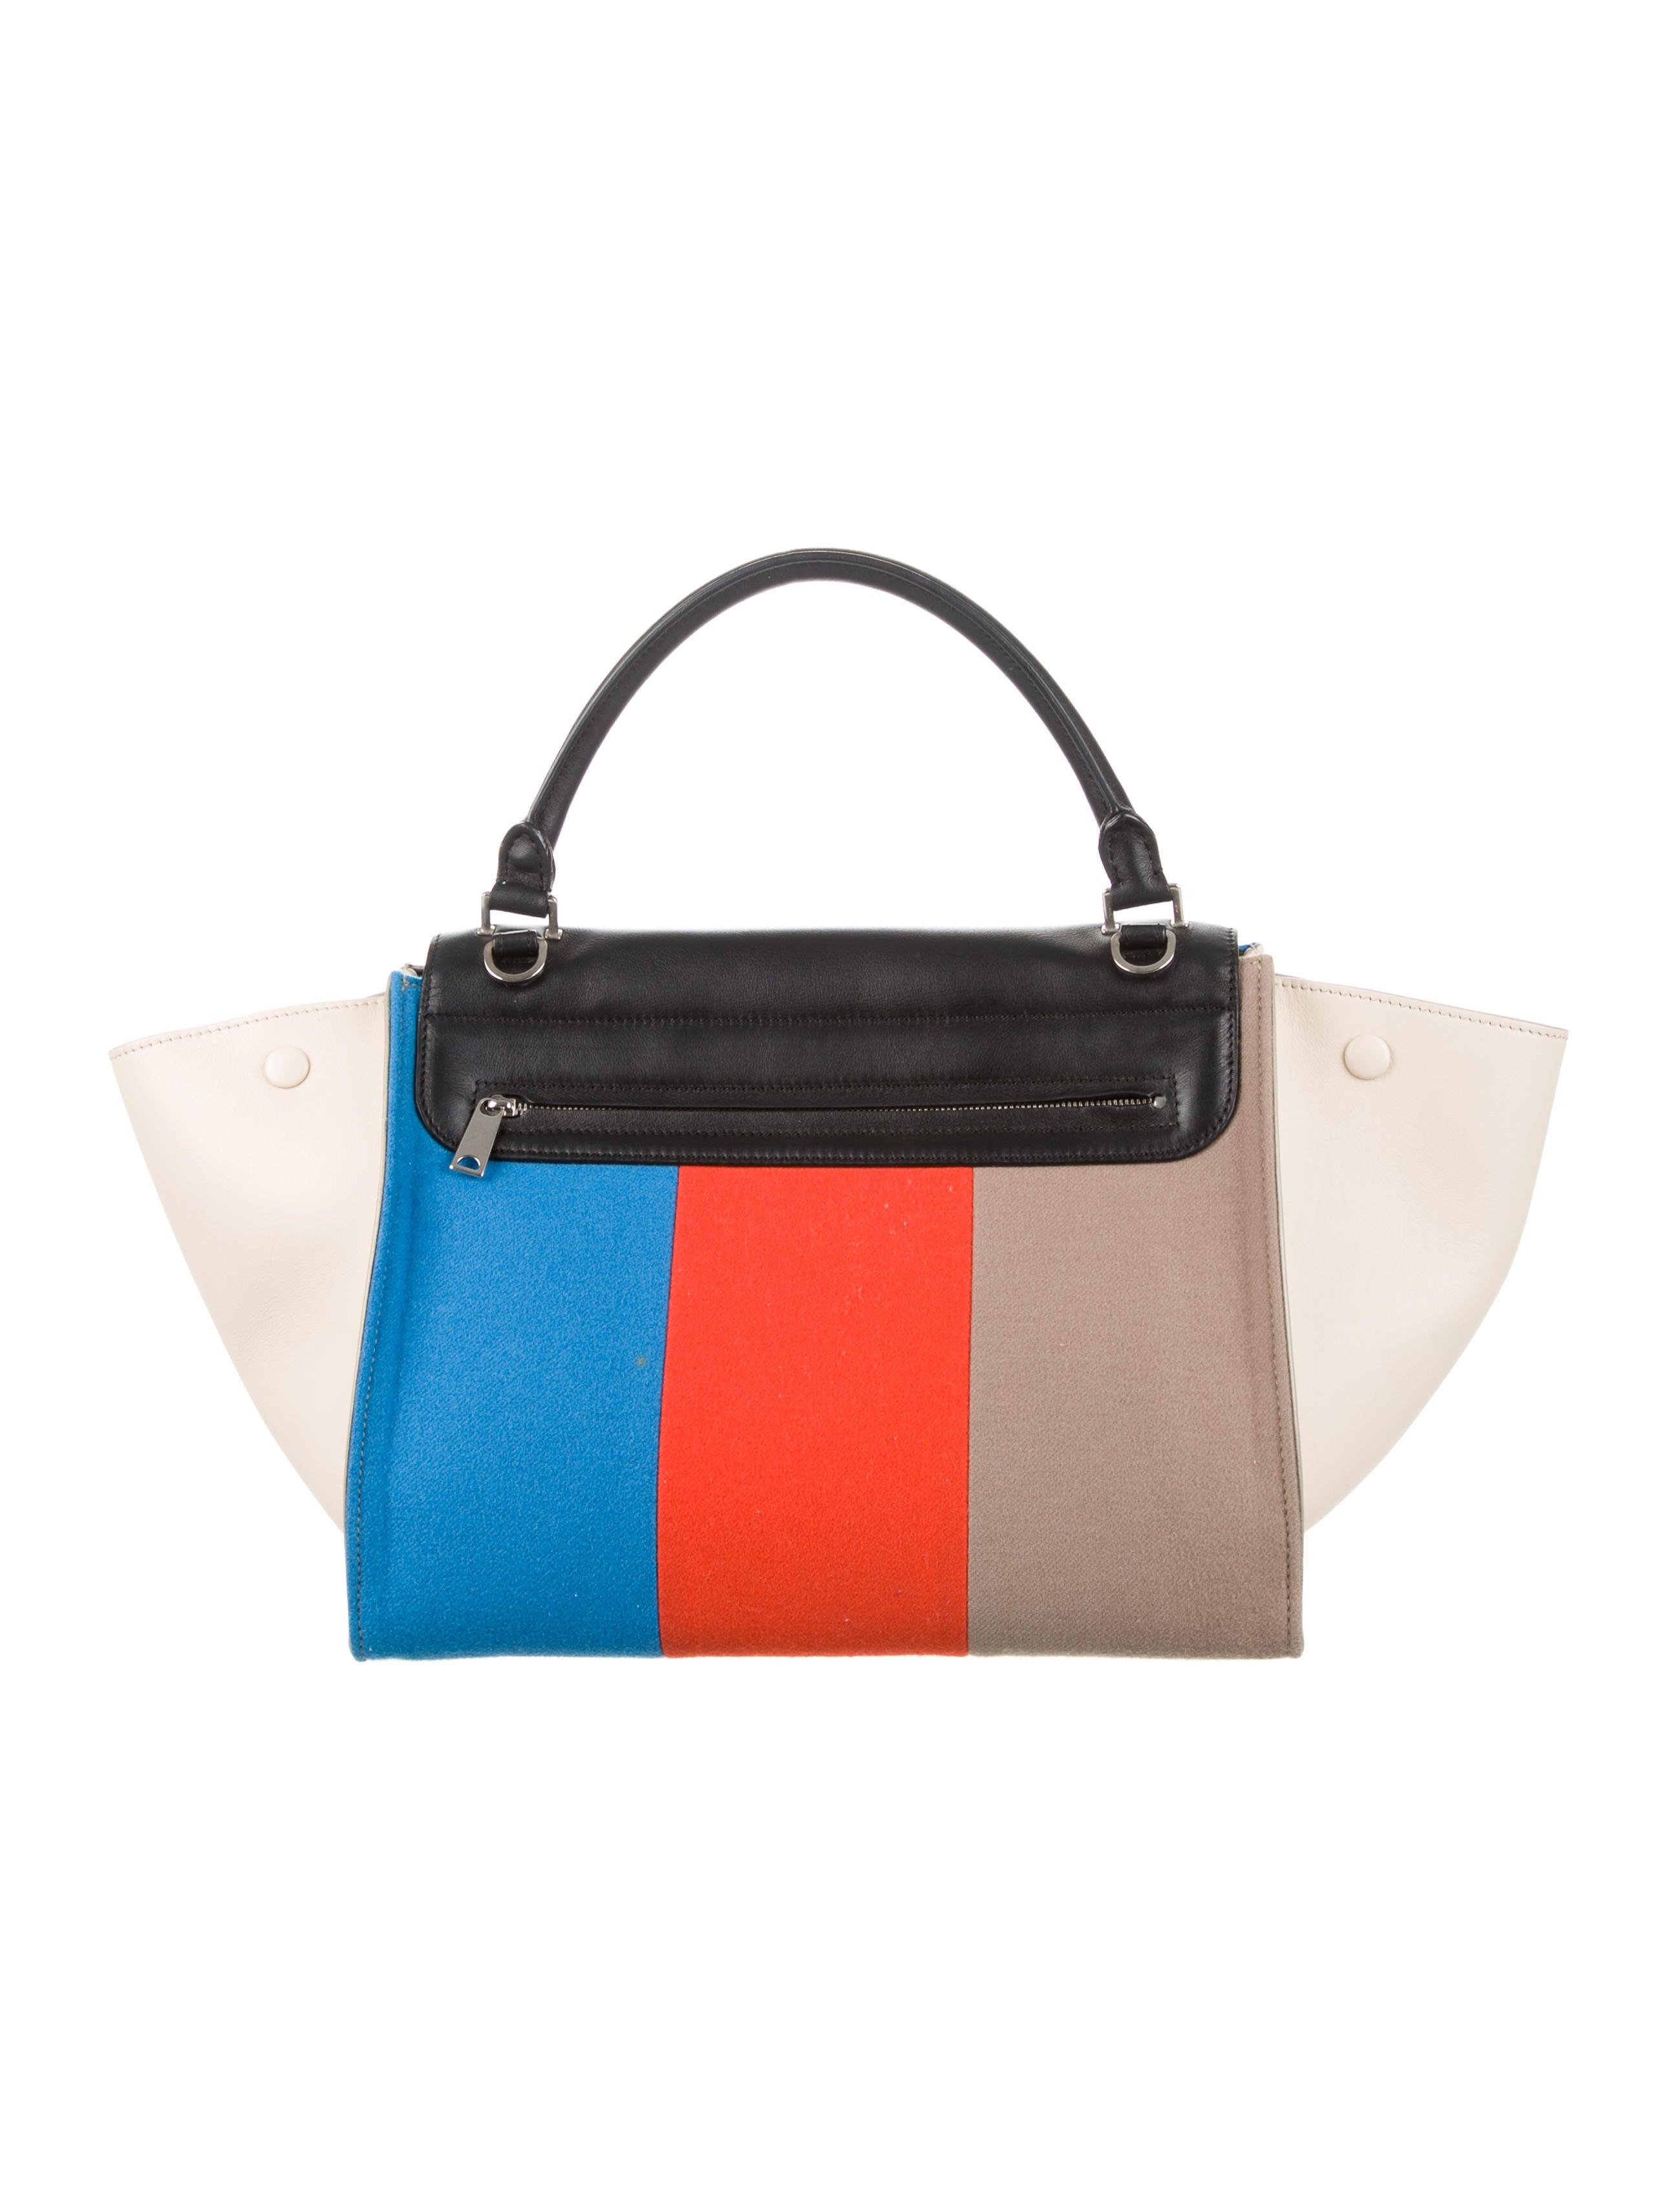 f064f0313035 Céline Colorblock Medium Trapeze Bag w  Tags - Handbags - CEL45709 ...